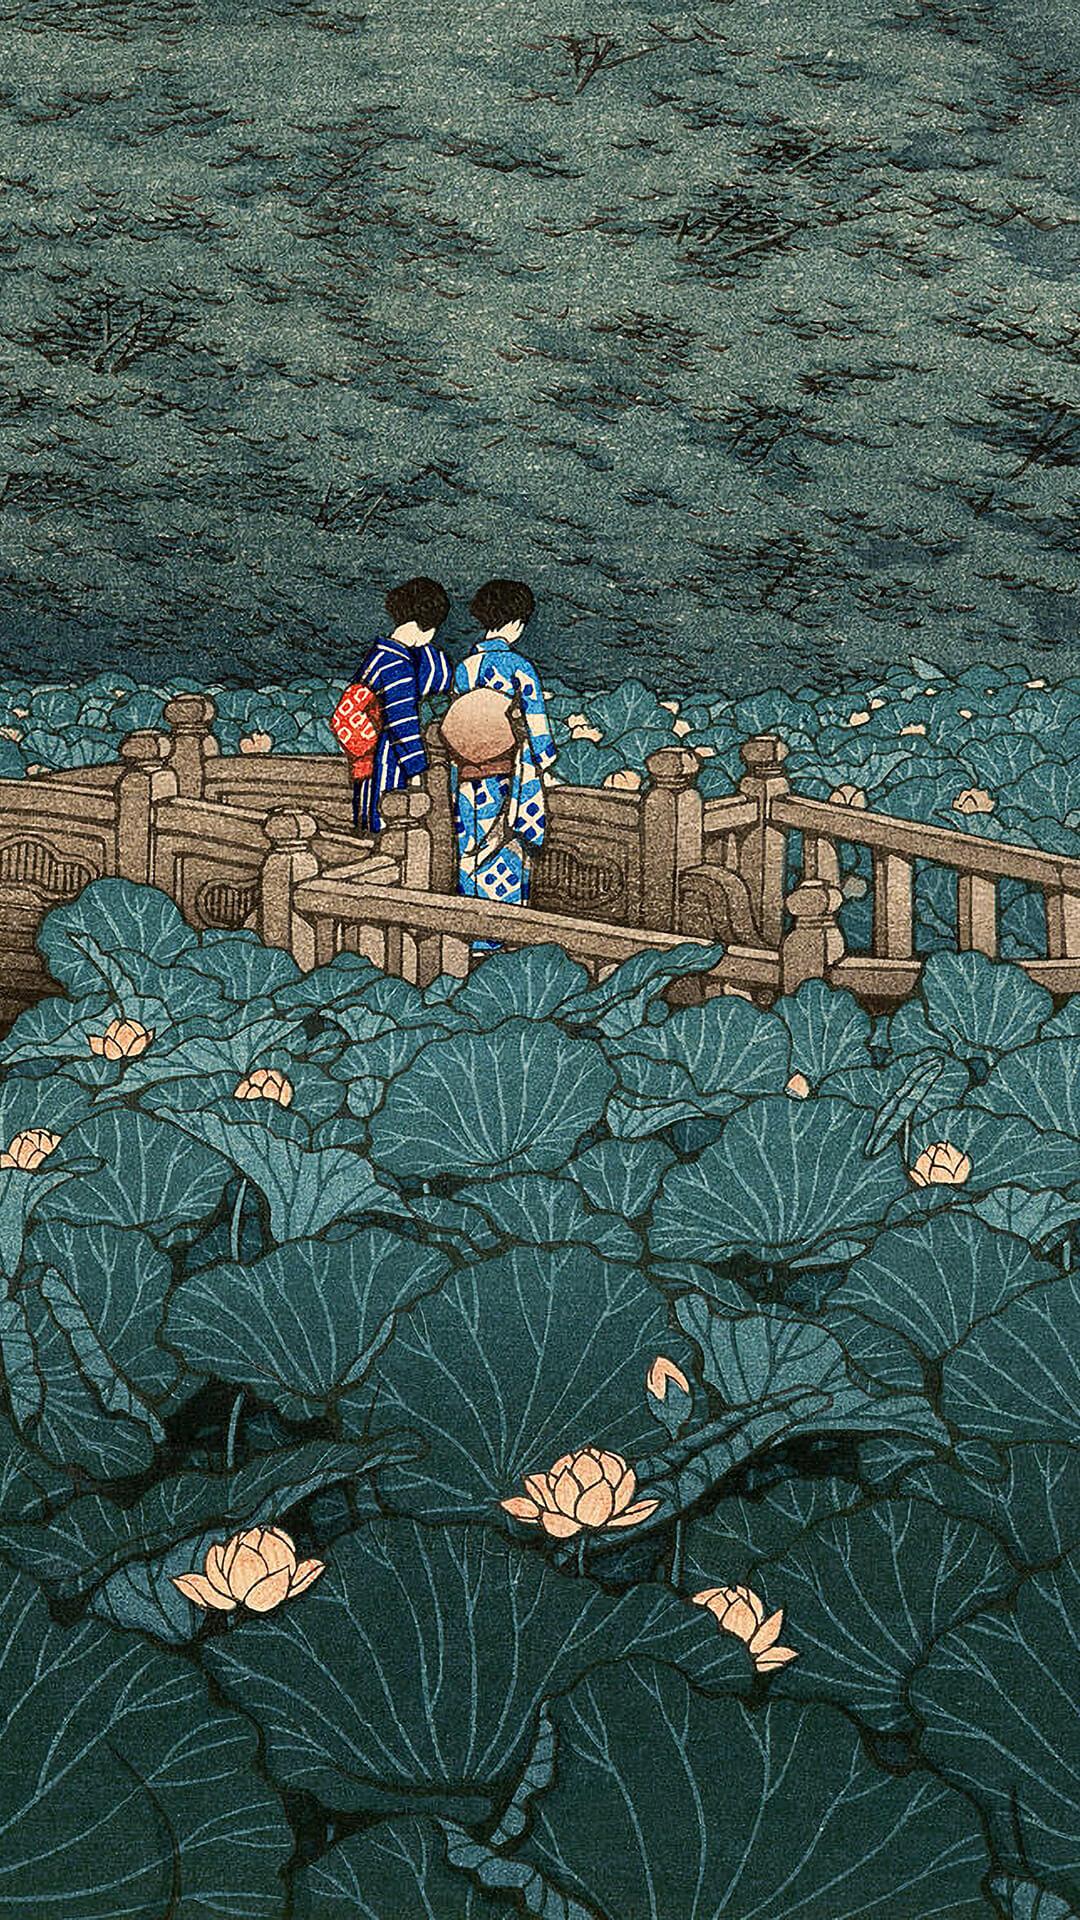 Kawase Hasui-Shiba benzaiten ike_1080x1920